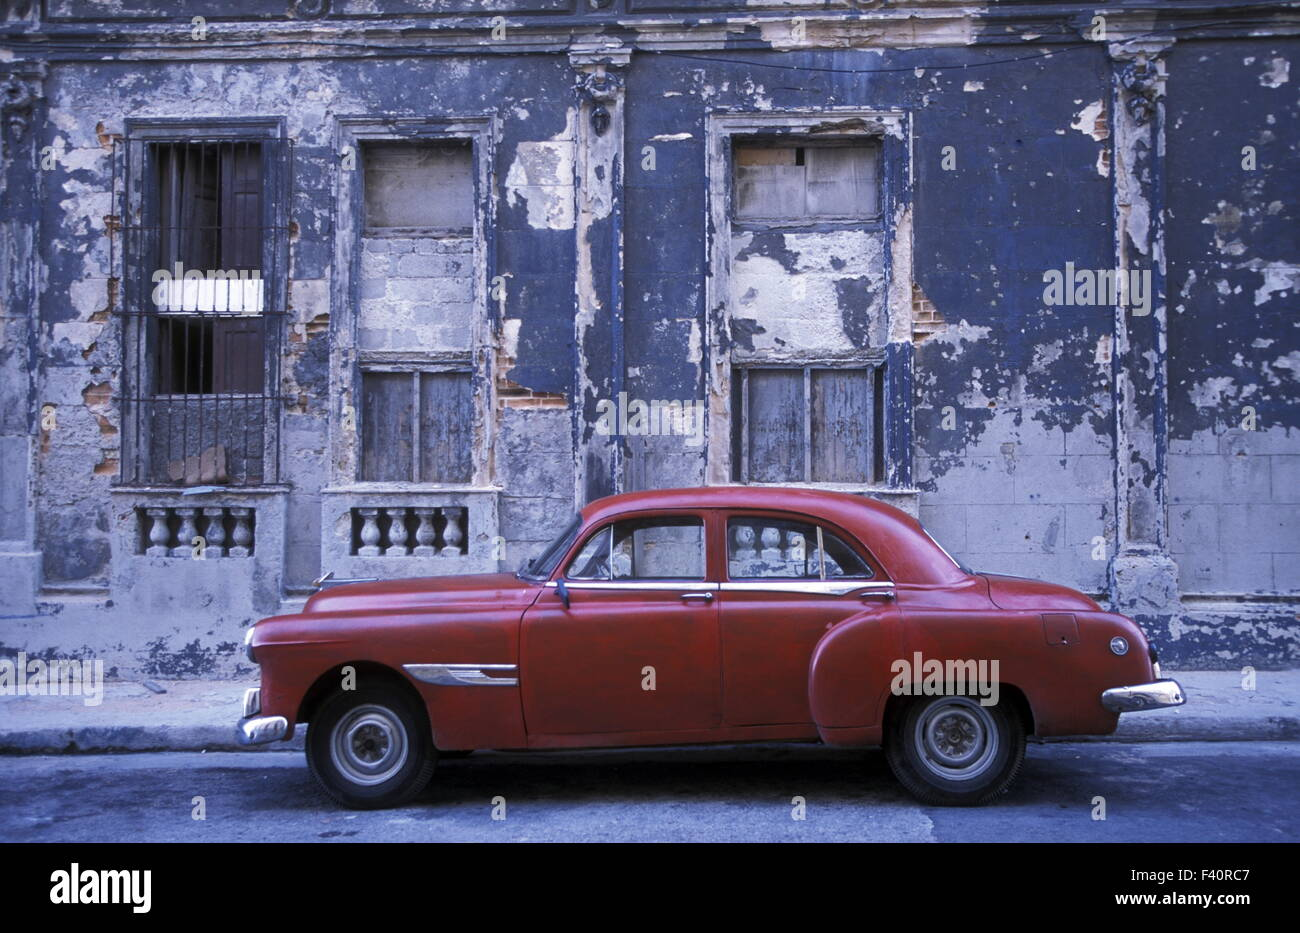 AMERIKA-KUBA-HAVANNA Stockbild